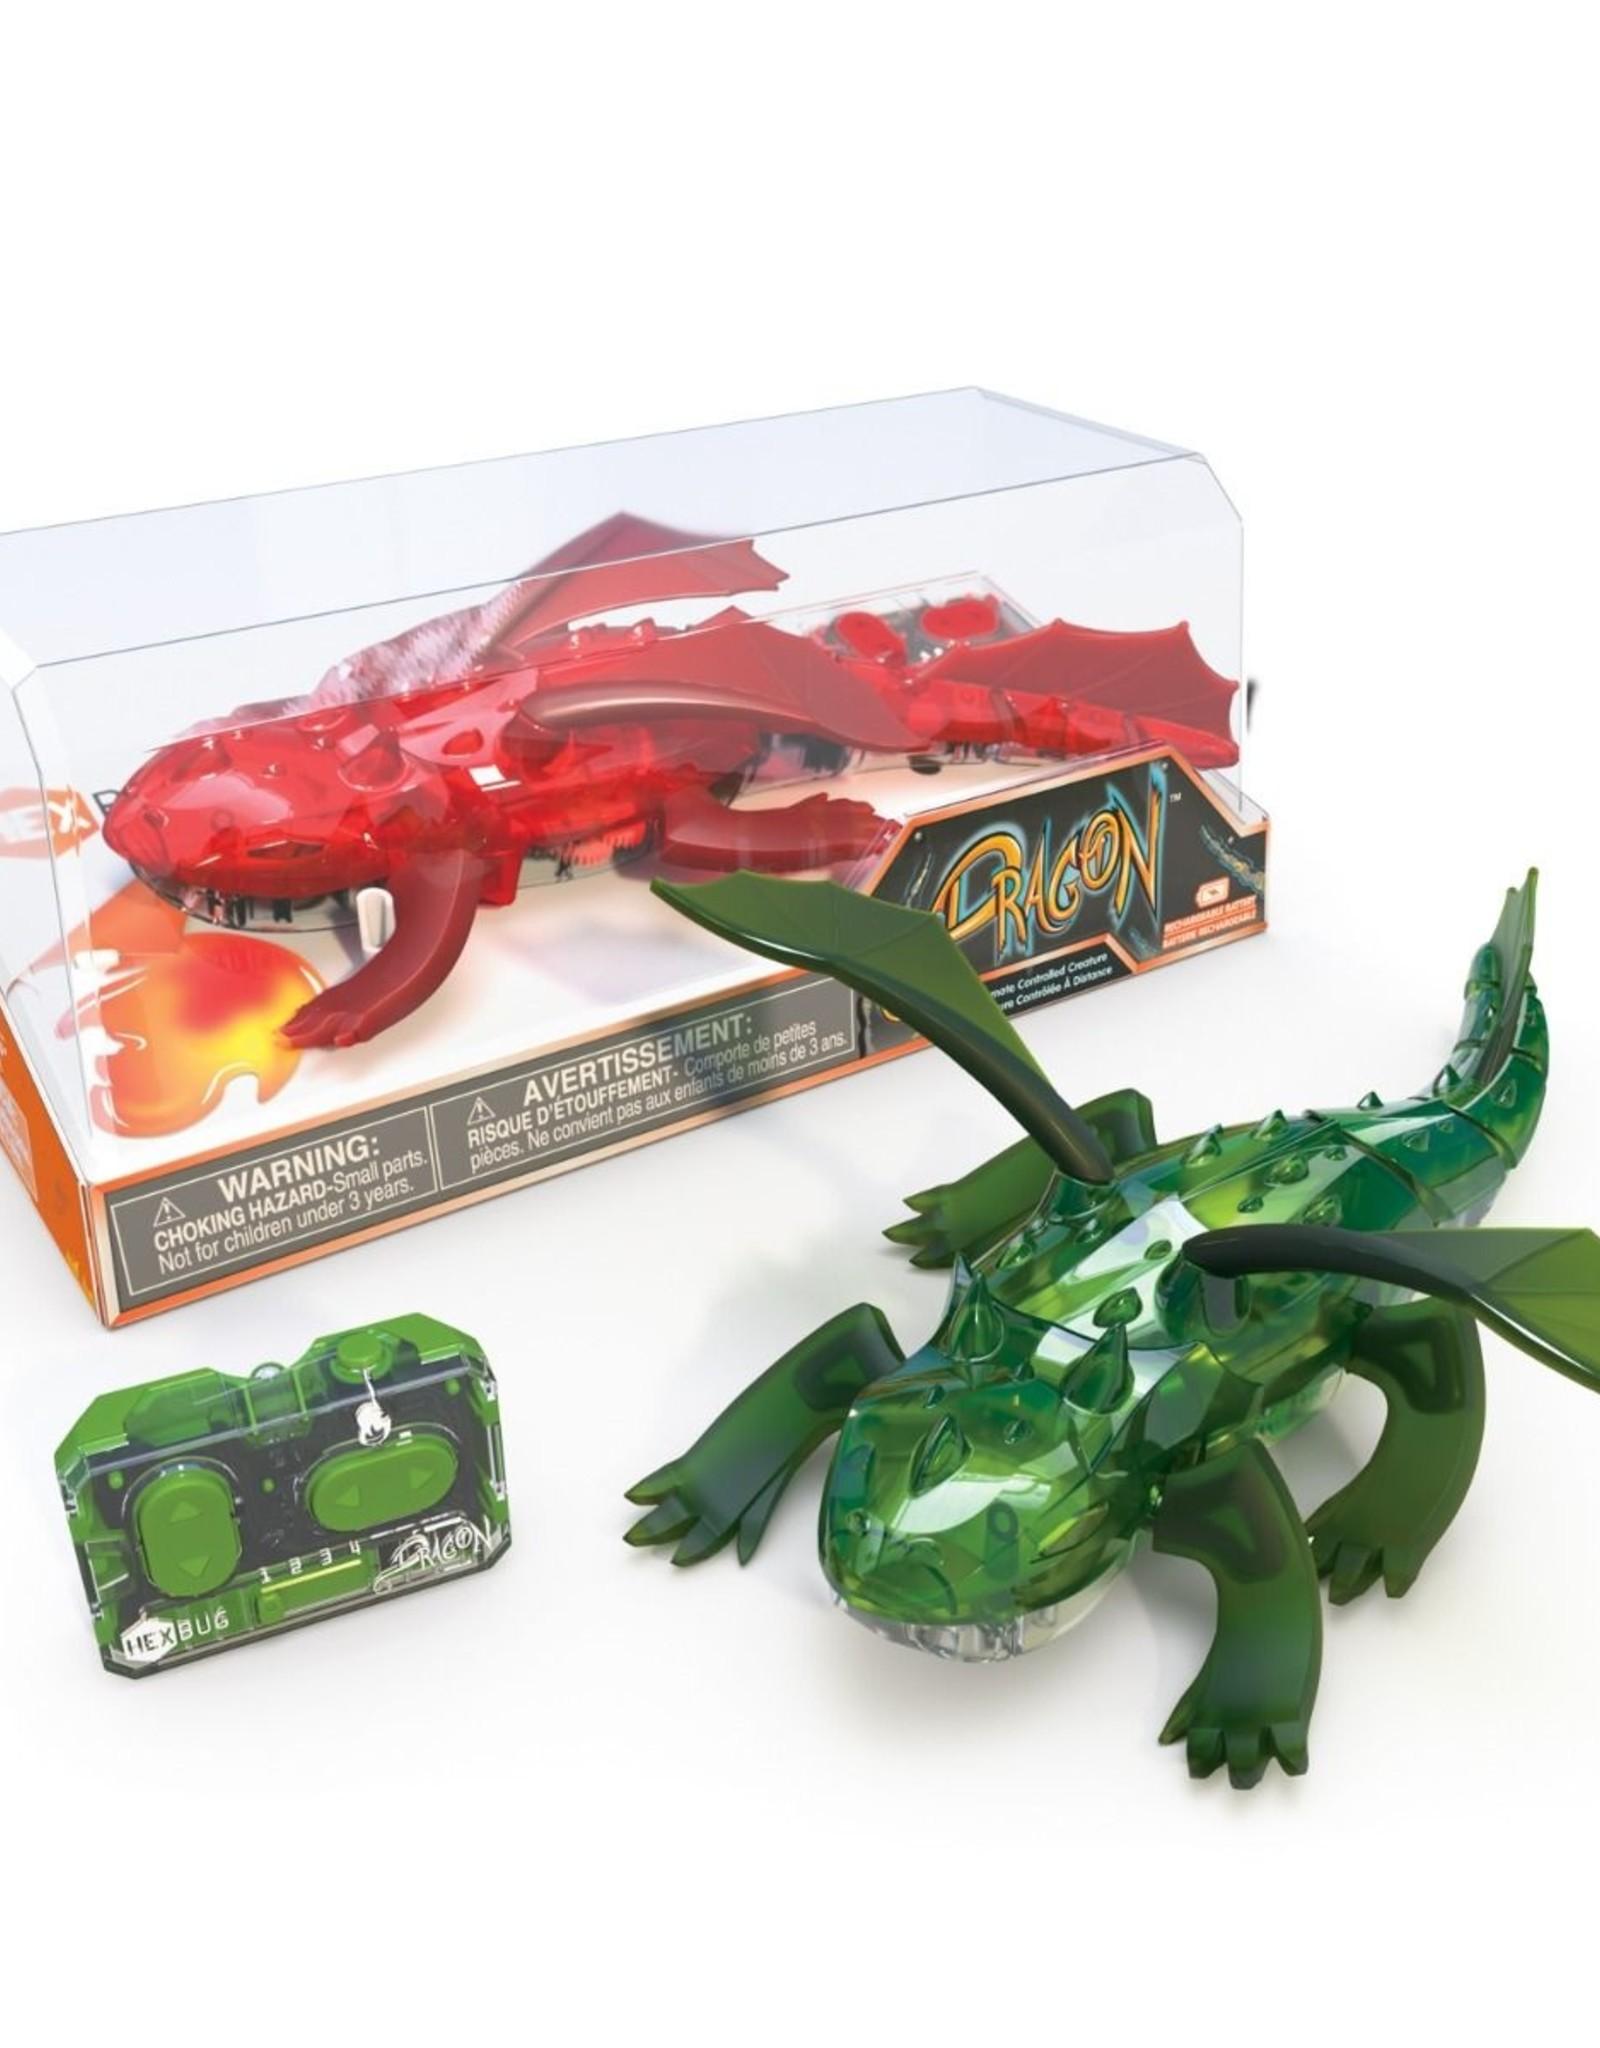 Hex Hexbug Dragon